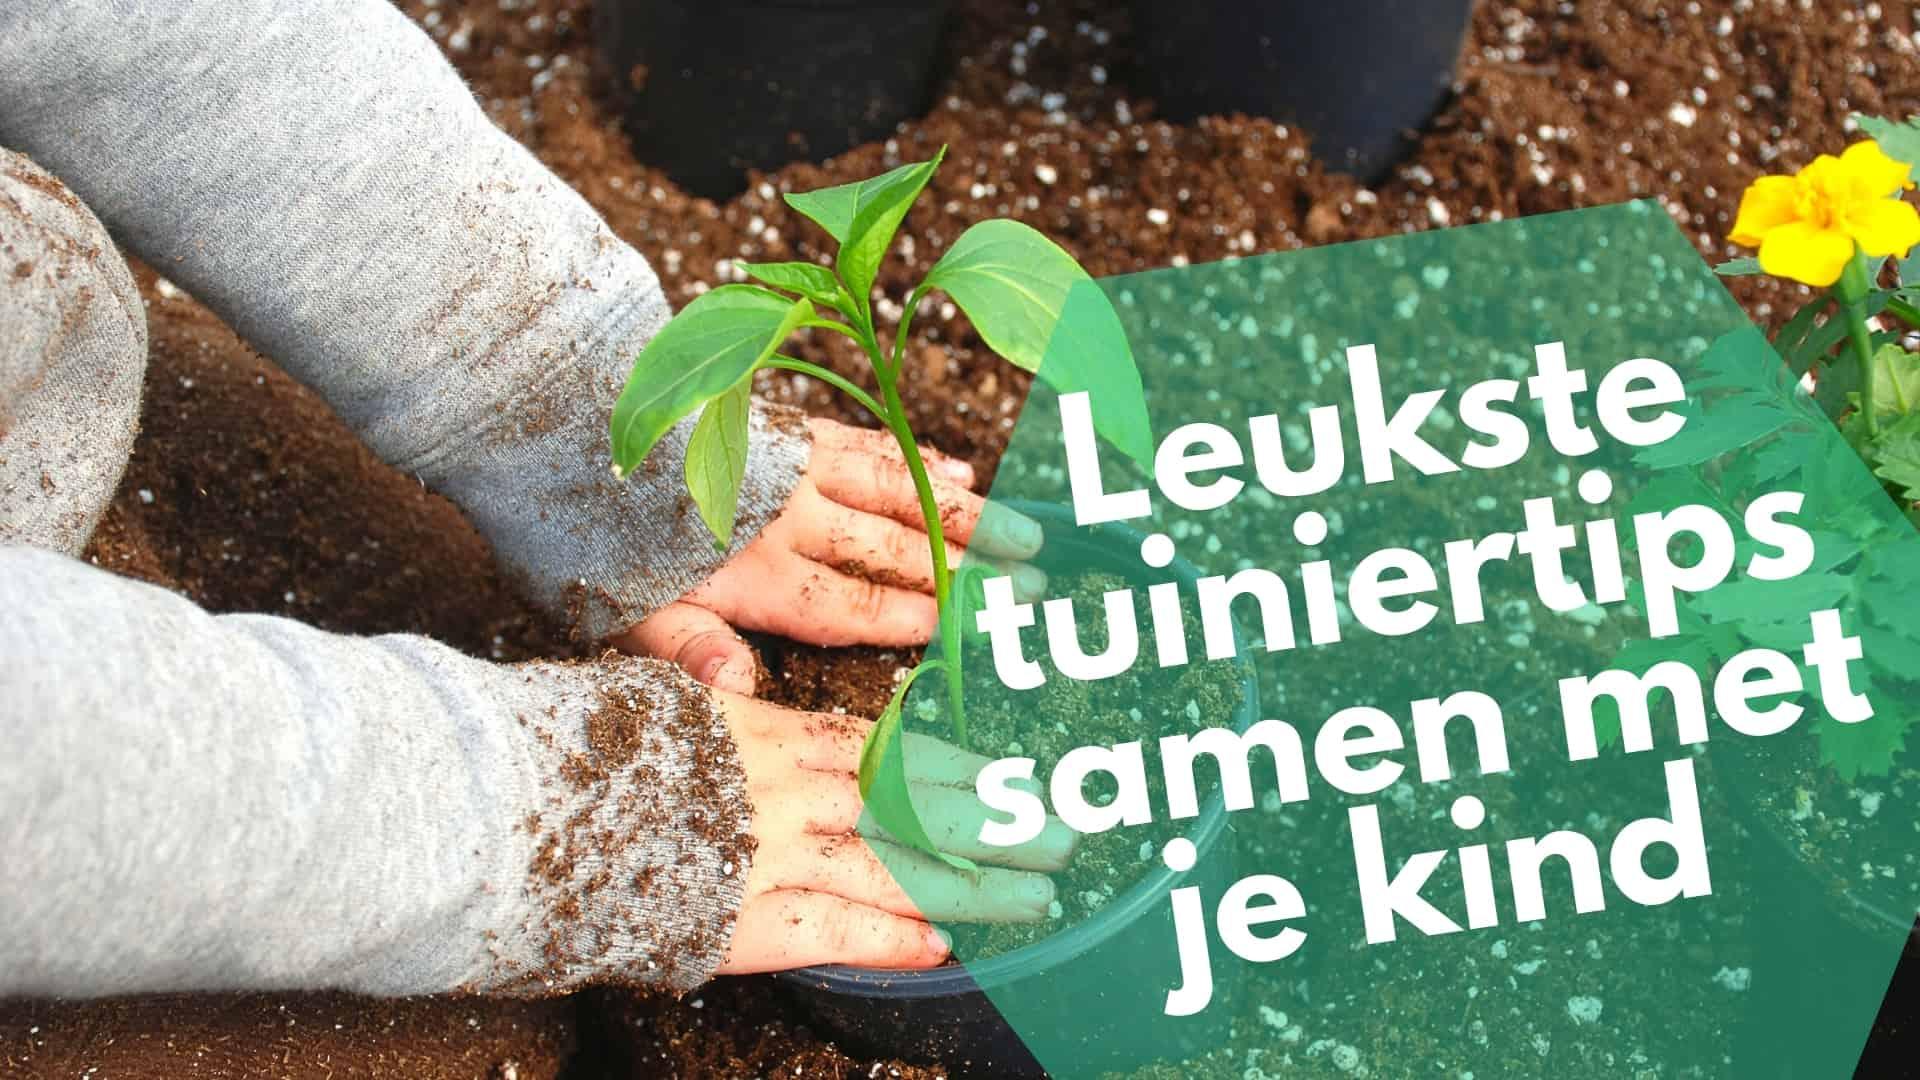 Leukste tuiniertips samen met je kind